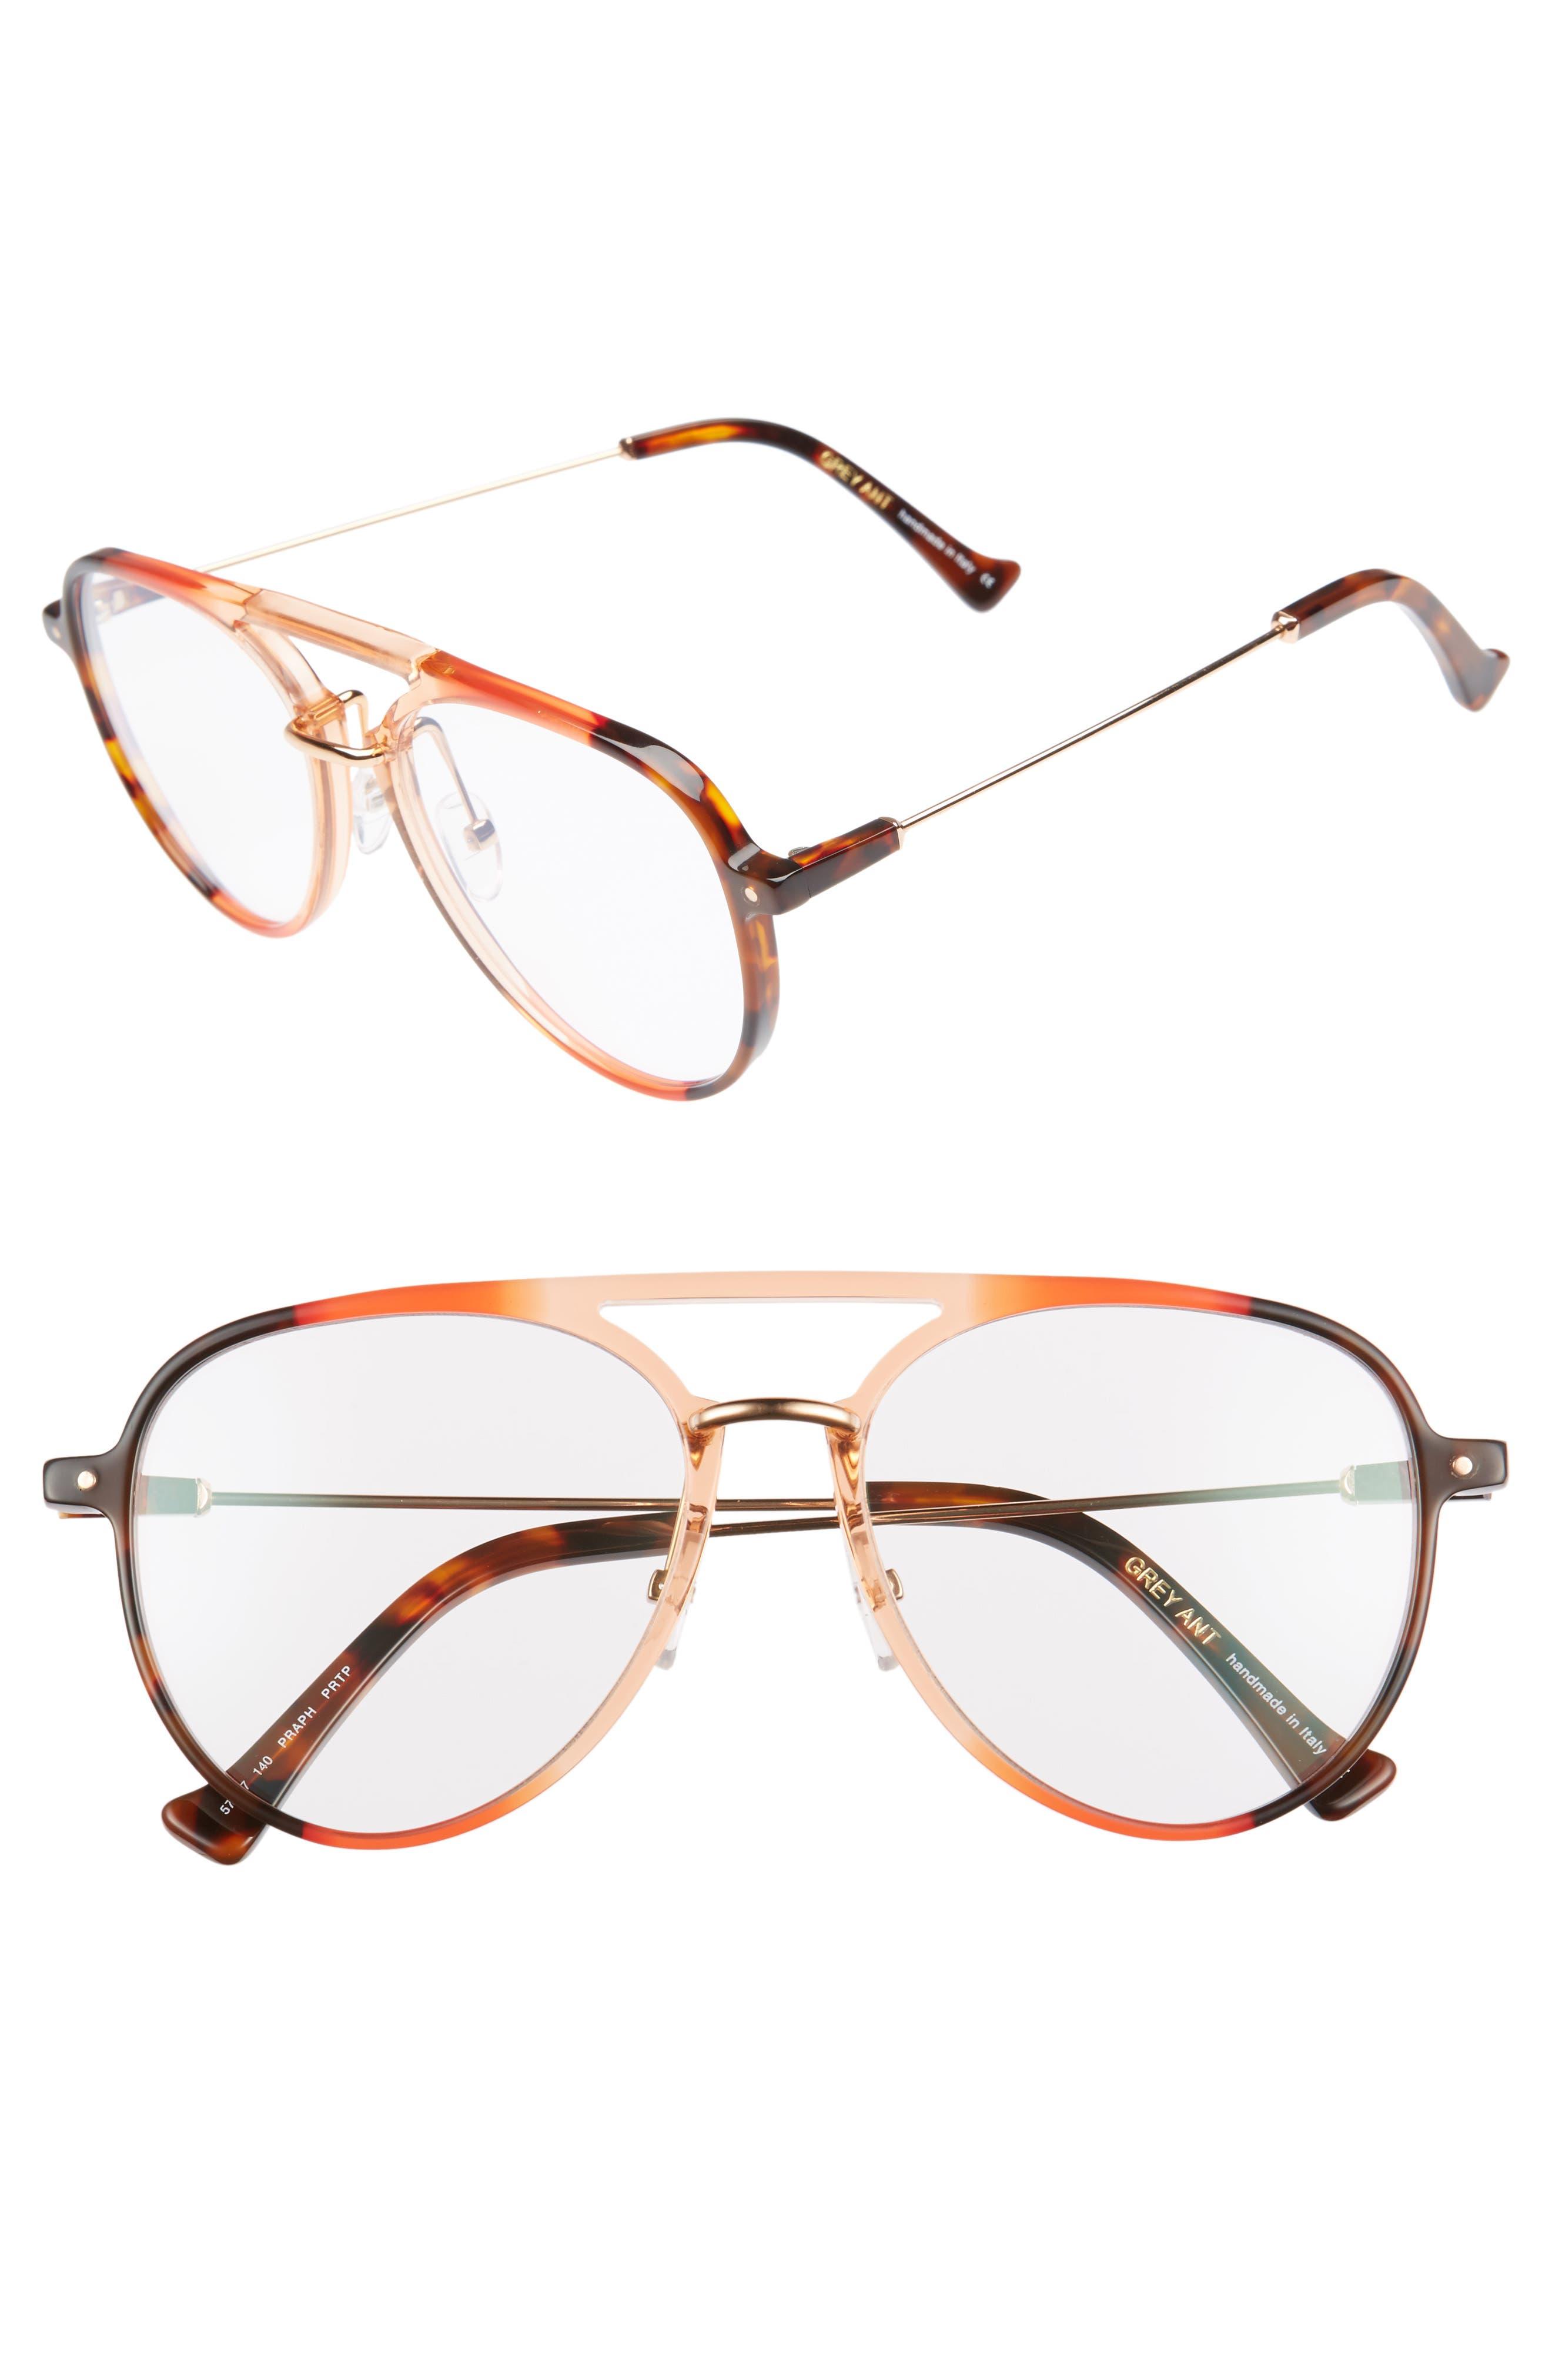 Praph 57mm Aviator Glasses,                         Main,                         color, Clear/Amber Tort Hardware